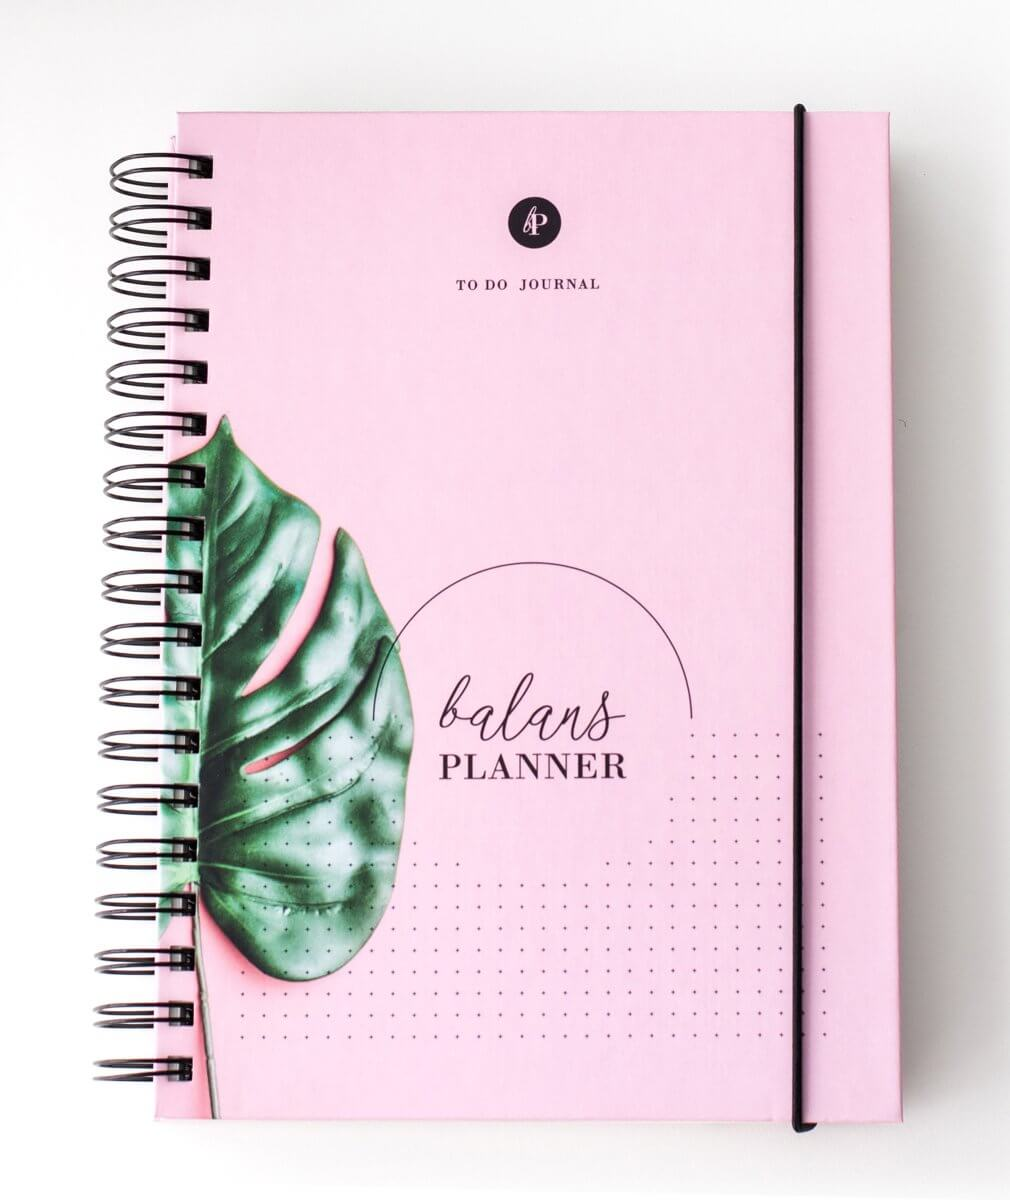 Balans-planner-pretty-in-pink